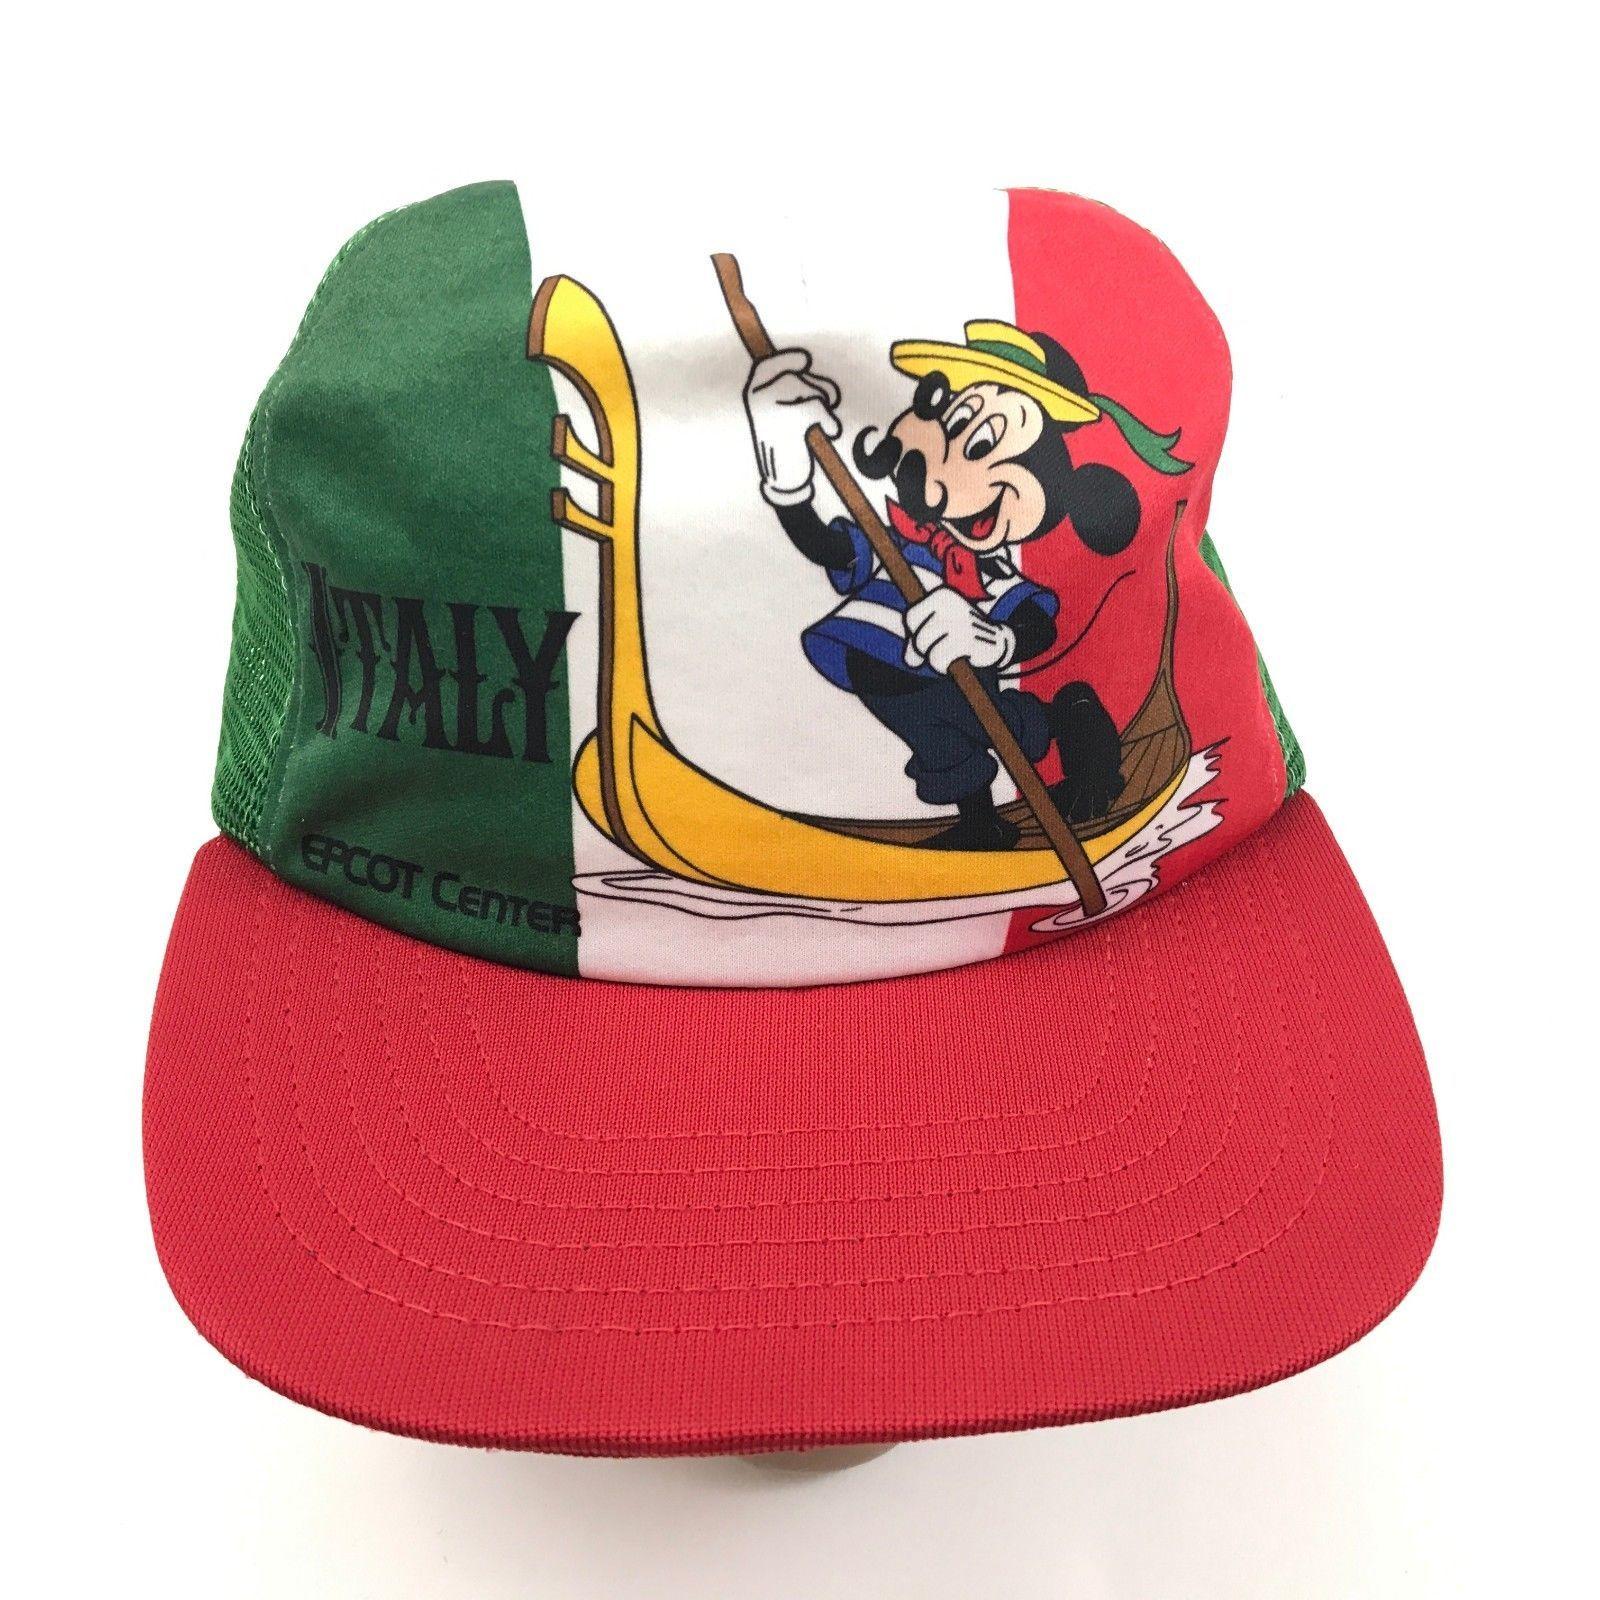 Vintage Mickey Maus Truckerhut Italien Epcot Zentrum Disney 1982 Union USA